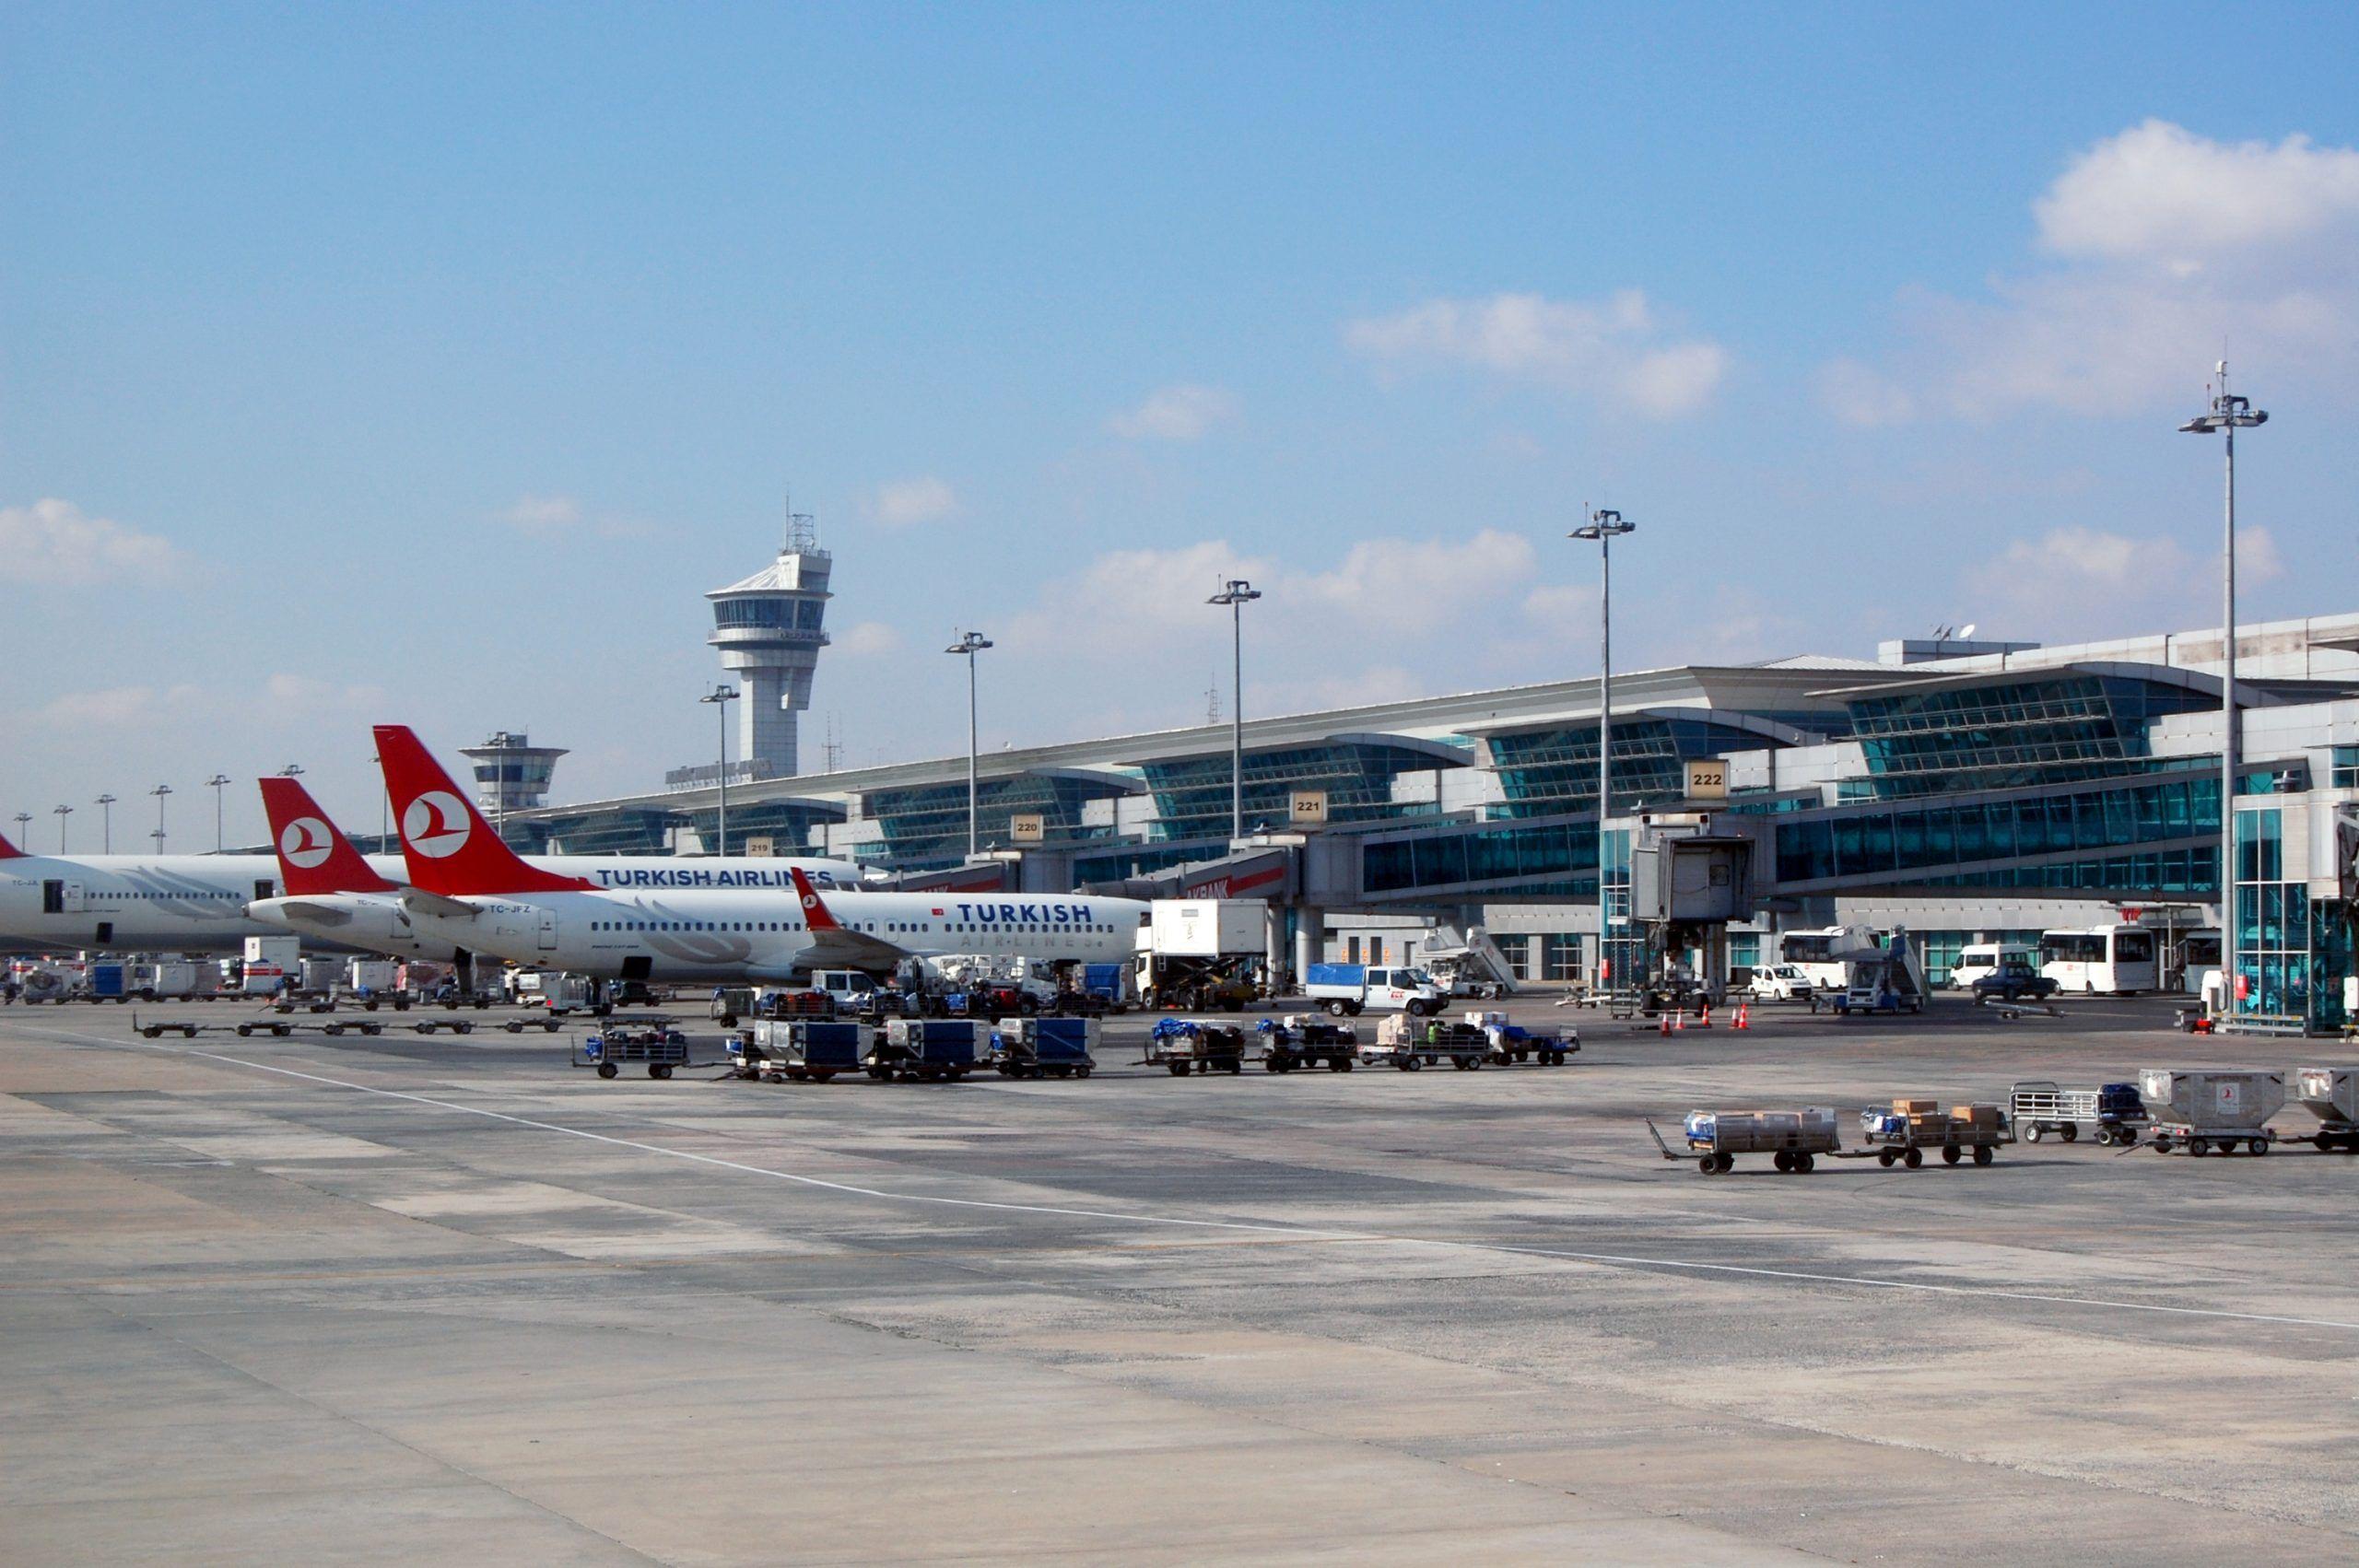 Aeroporto di Istanbul